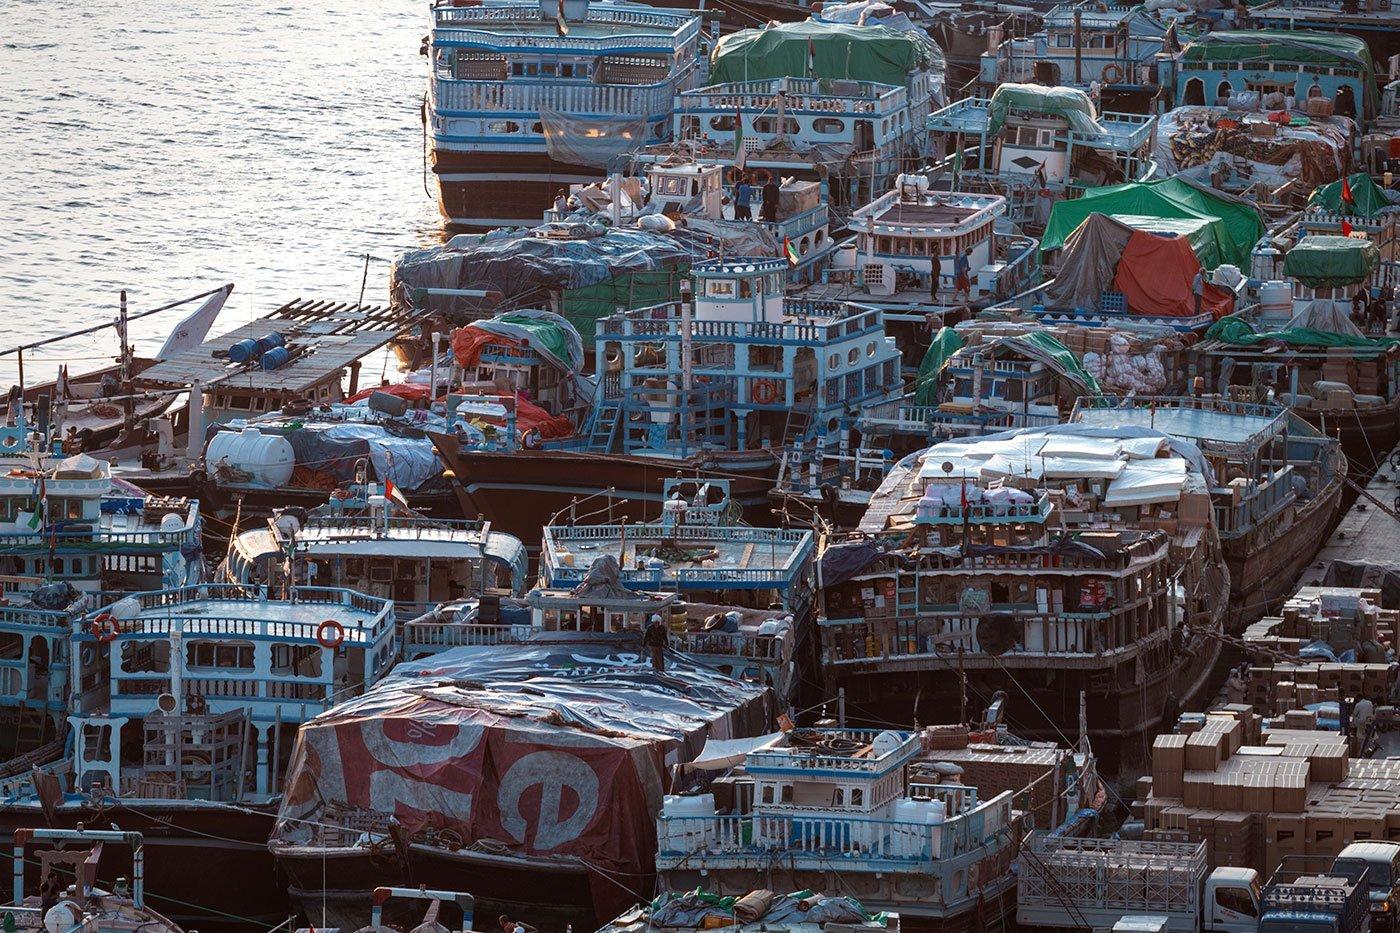 closeup of the Iranian trade boats along the Dubai creek